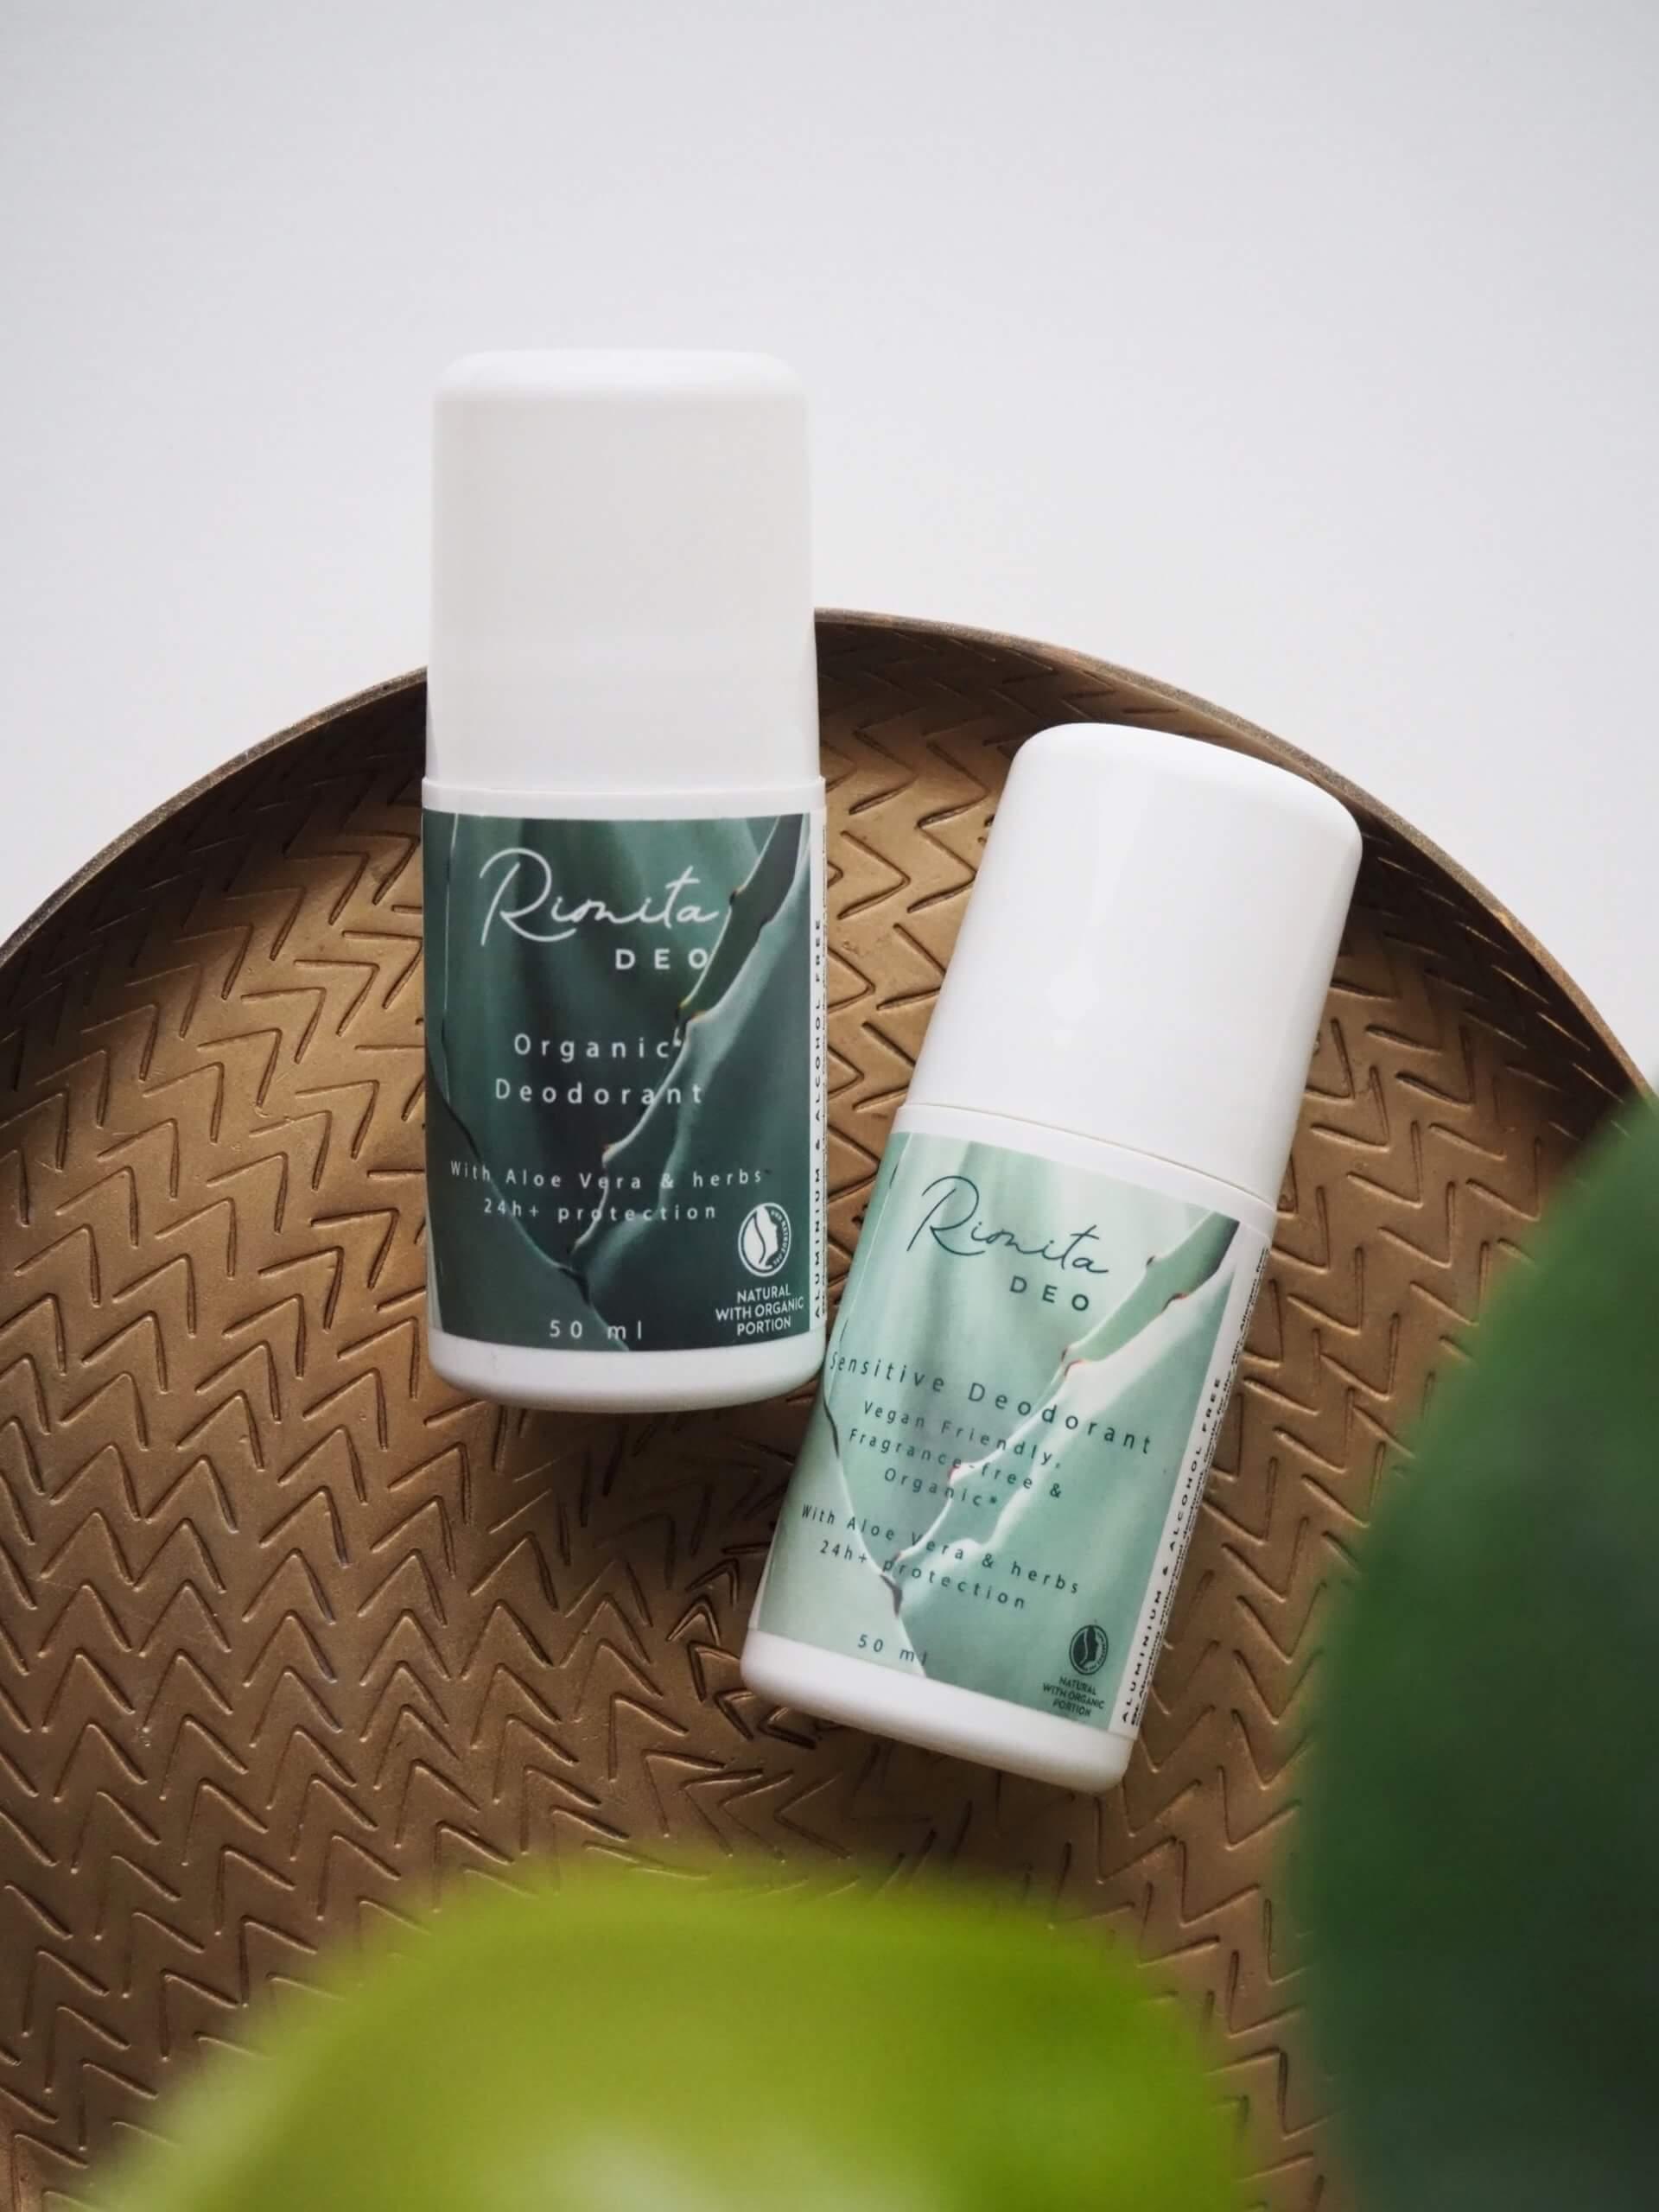 rimita green deodorantti kokemuksia